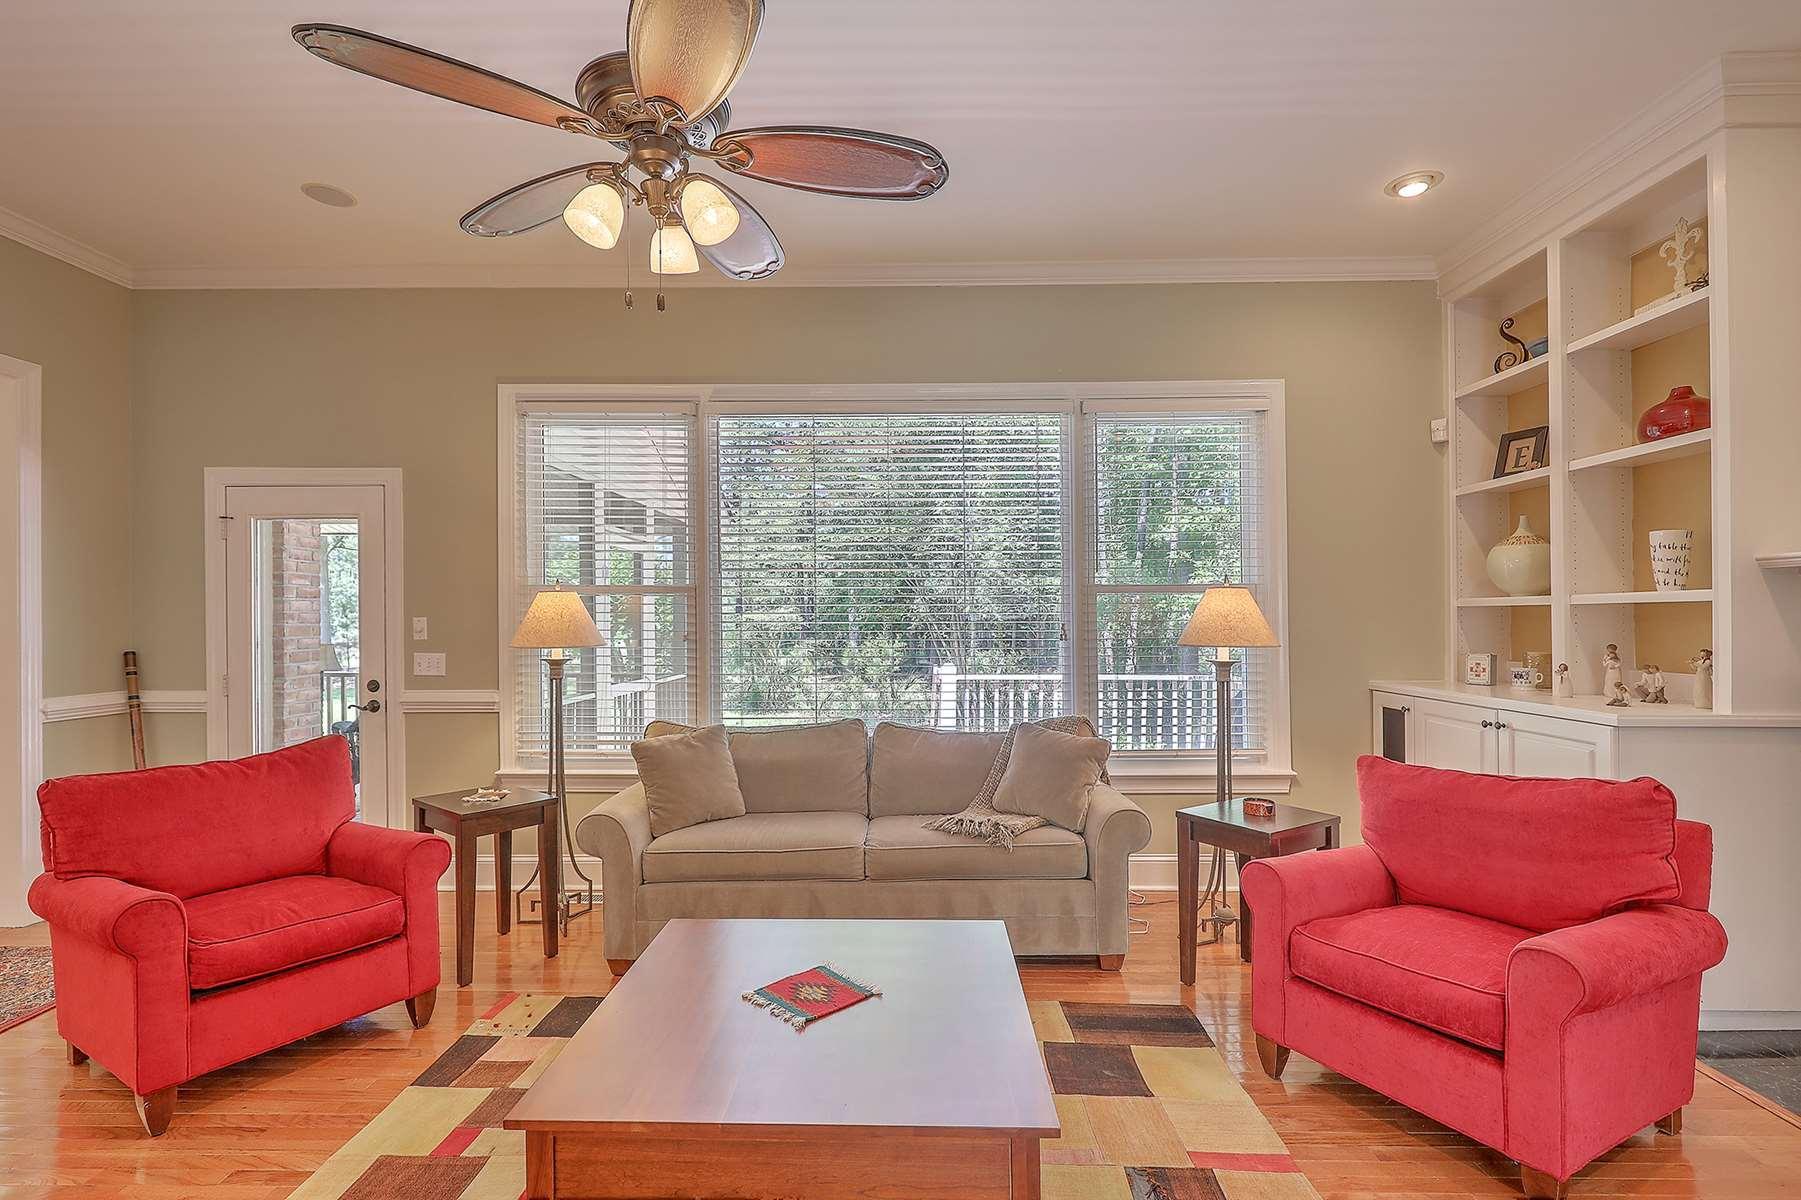 Dunes West Homes For Sale - 2961 Pignatelli, Mount Pleasant, SC - 2